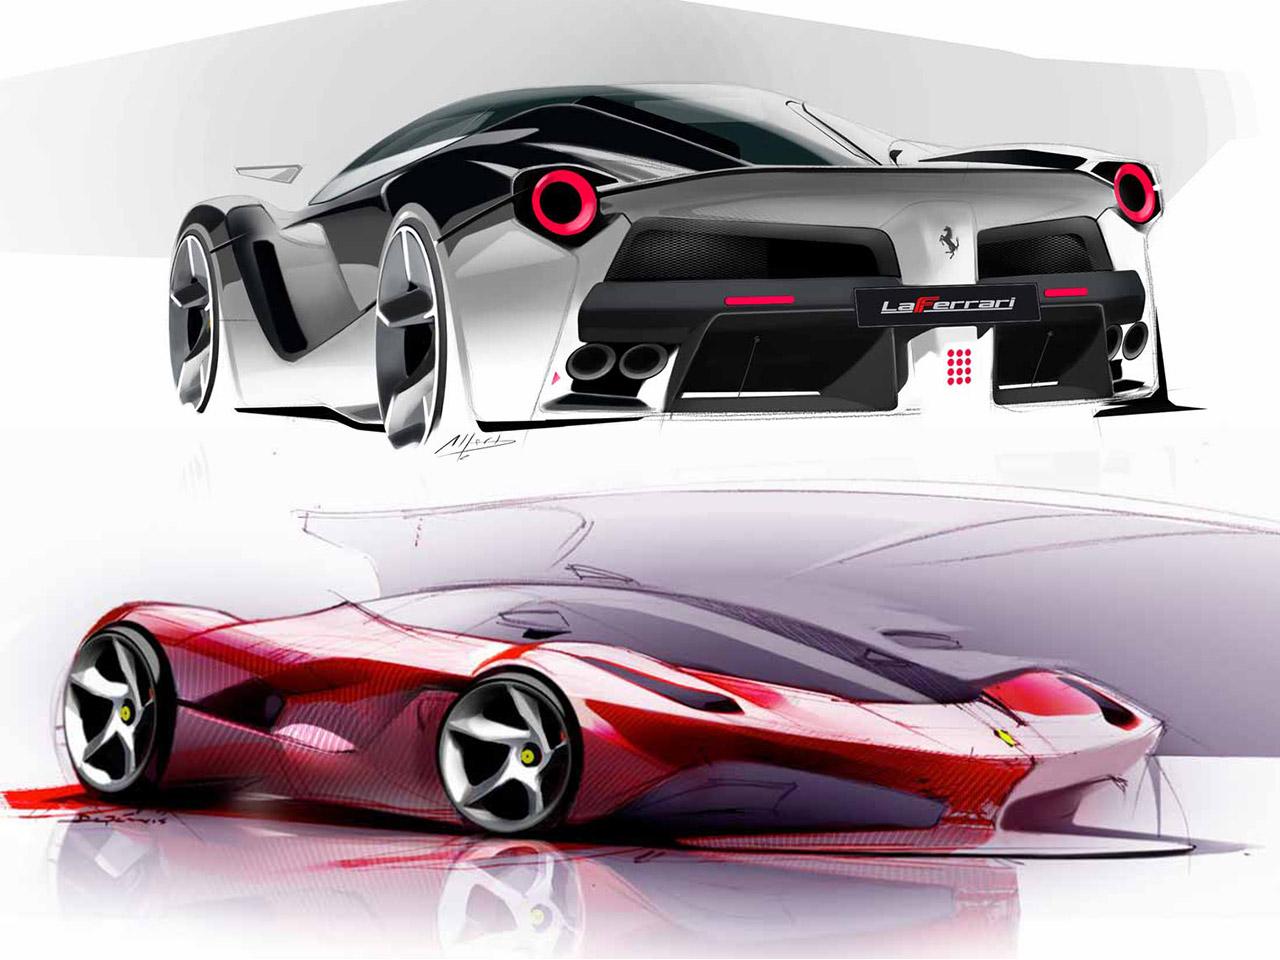 Drawn ferarri epic car Pinterest CG CG cars 01